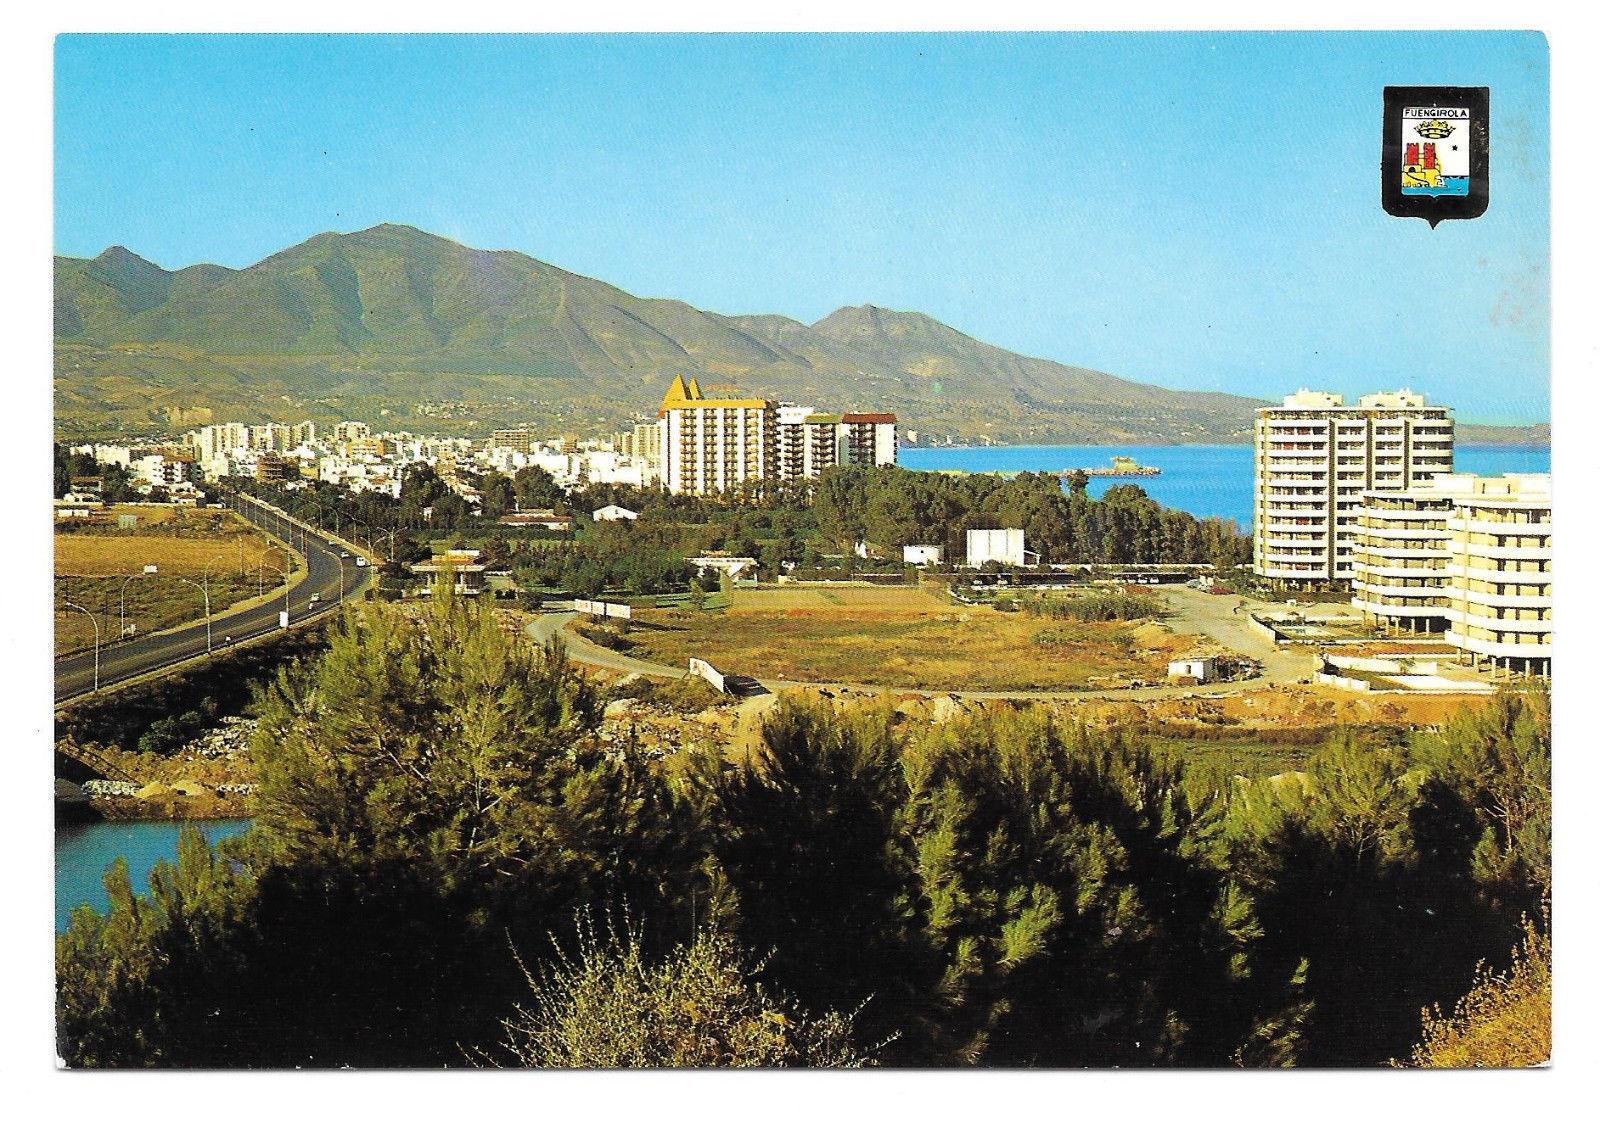 Spain Costa del Sol Fuengirola Birds Eye View Vtg Postcard 4X6